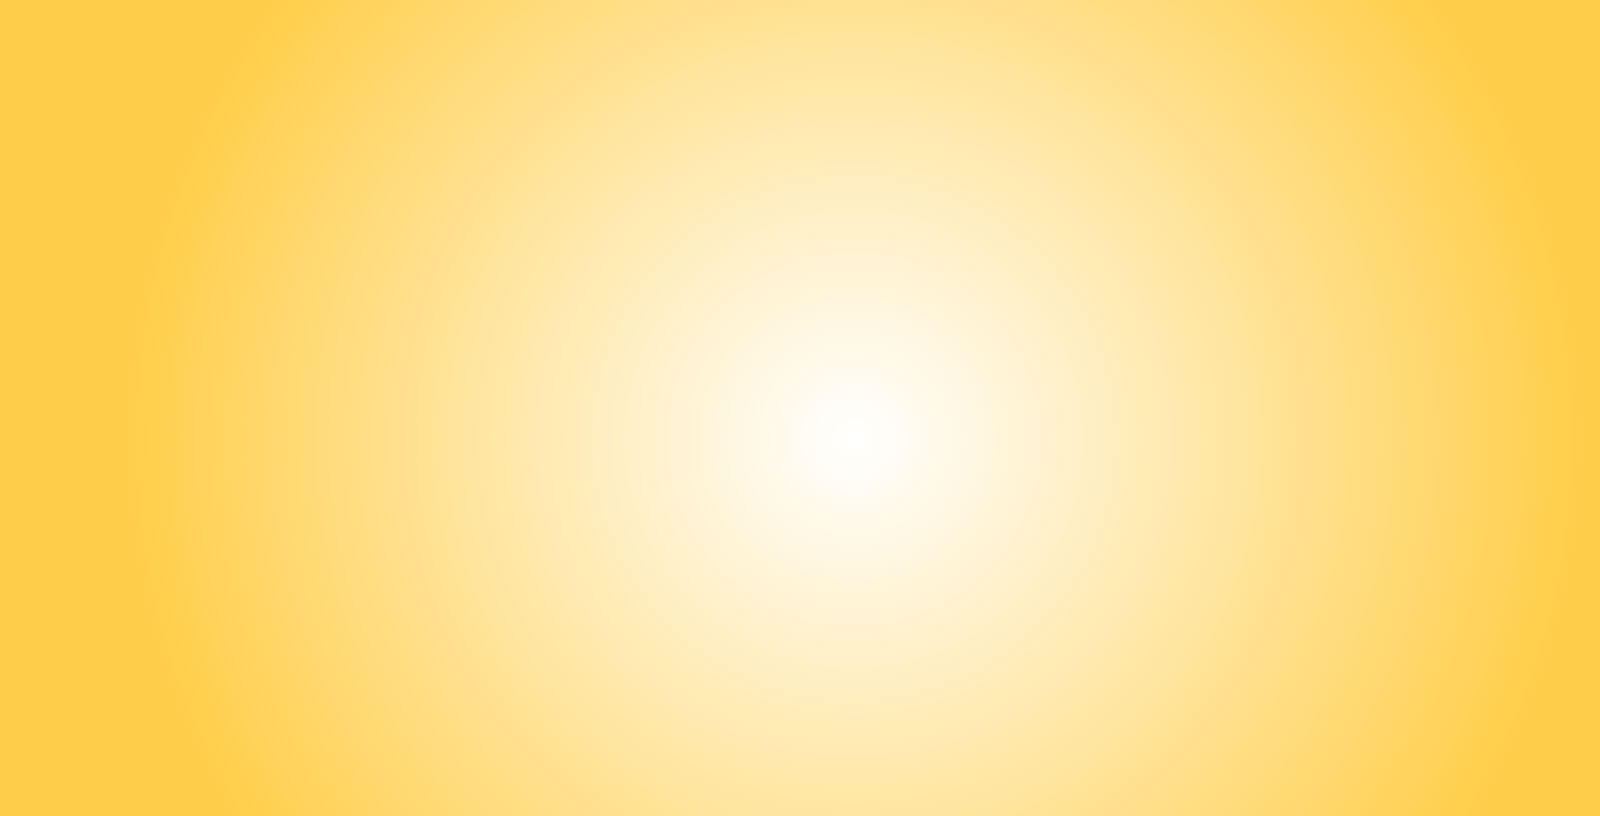 yellowbg1